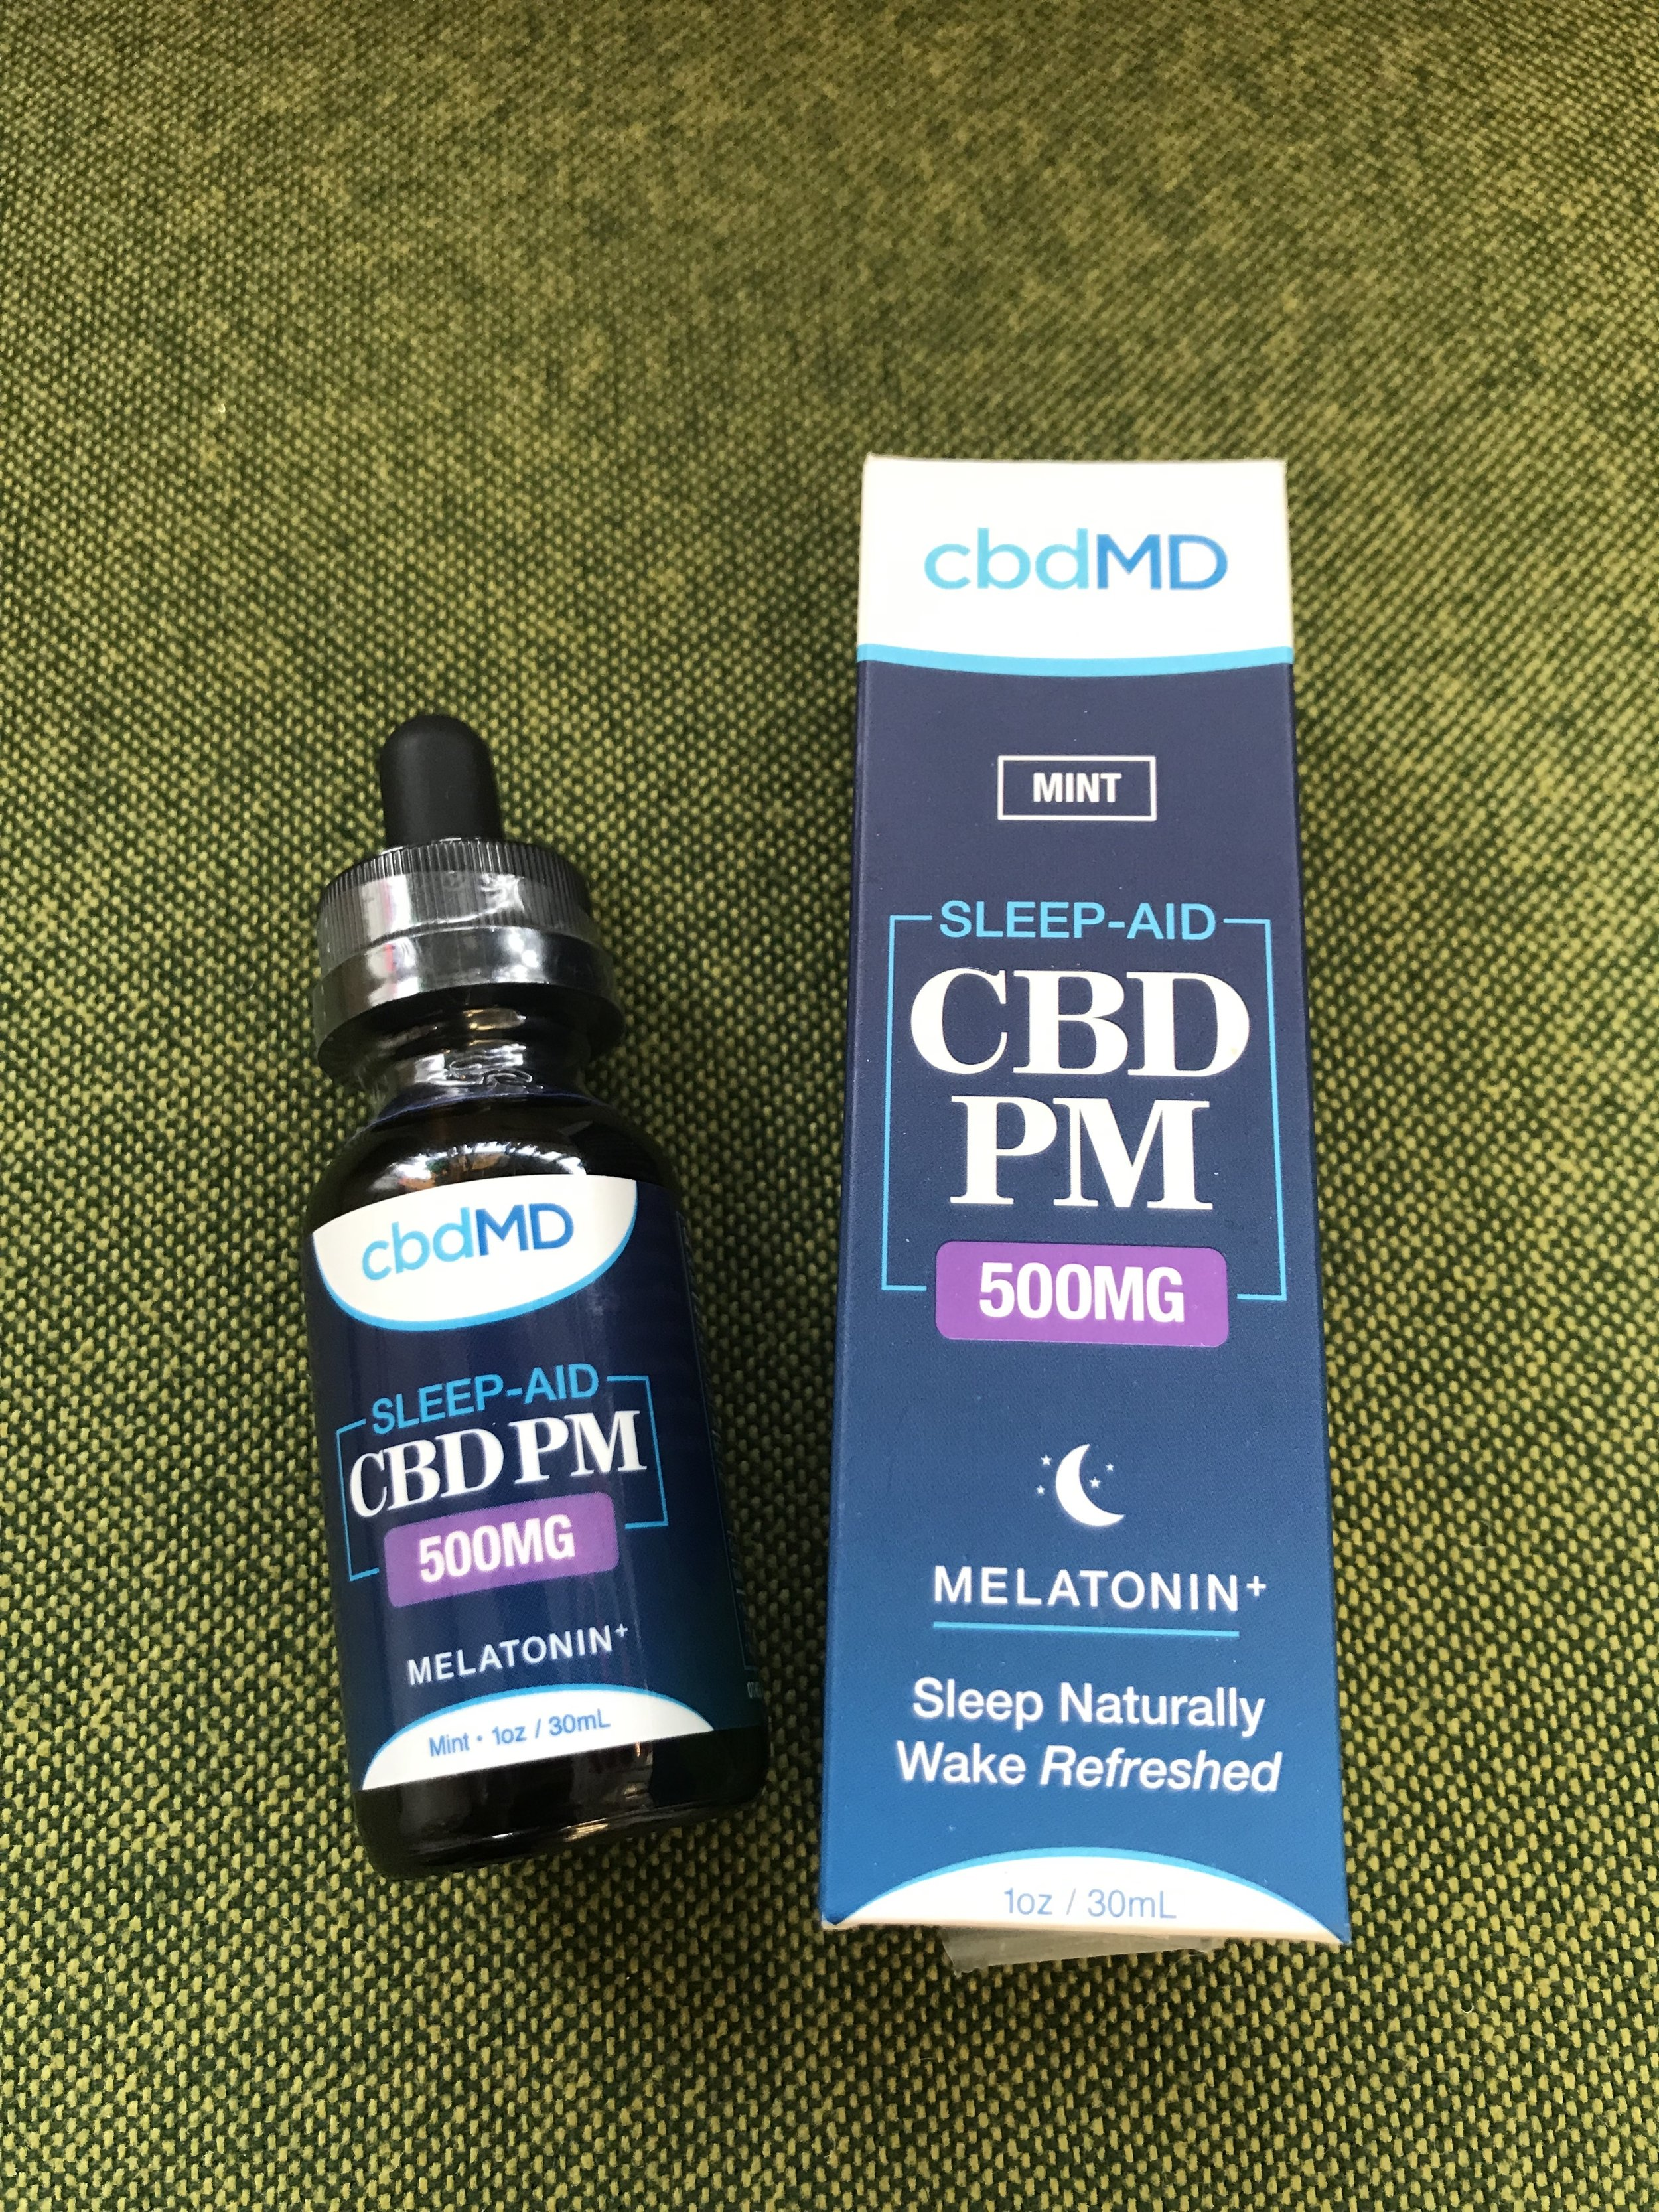 cbdMD PM Sleep Aid 500mg - $55.00